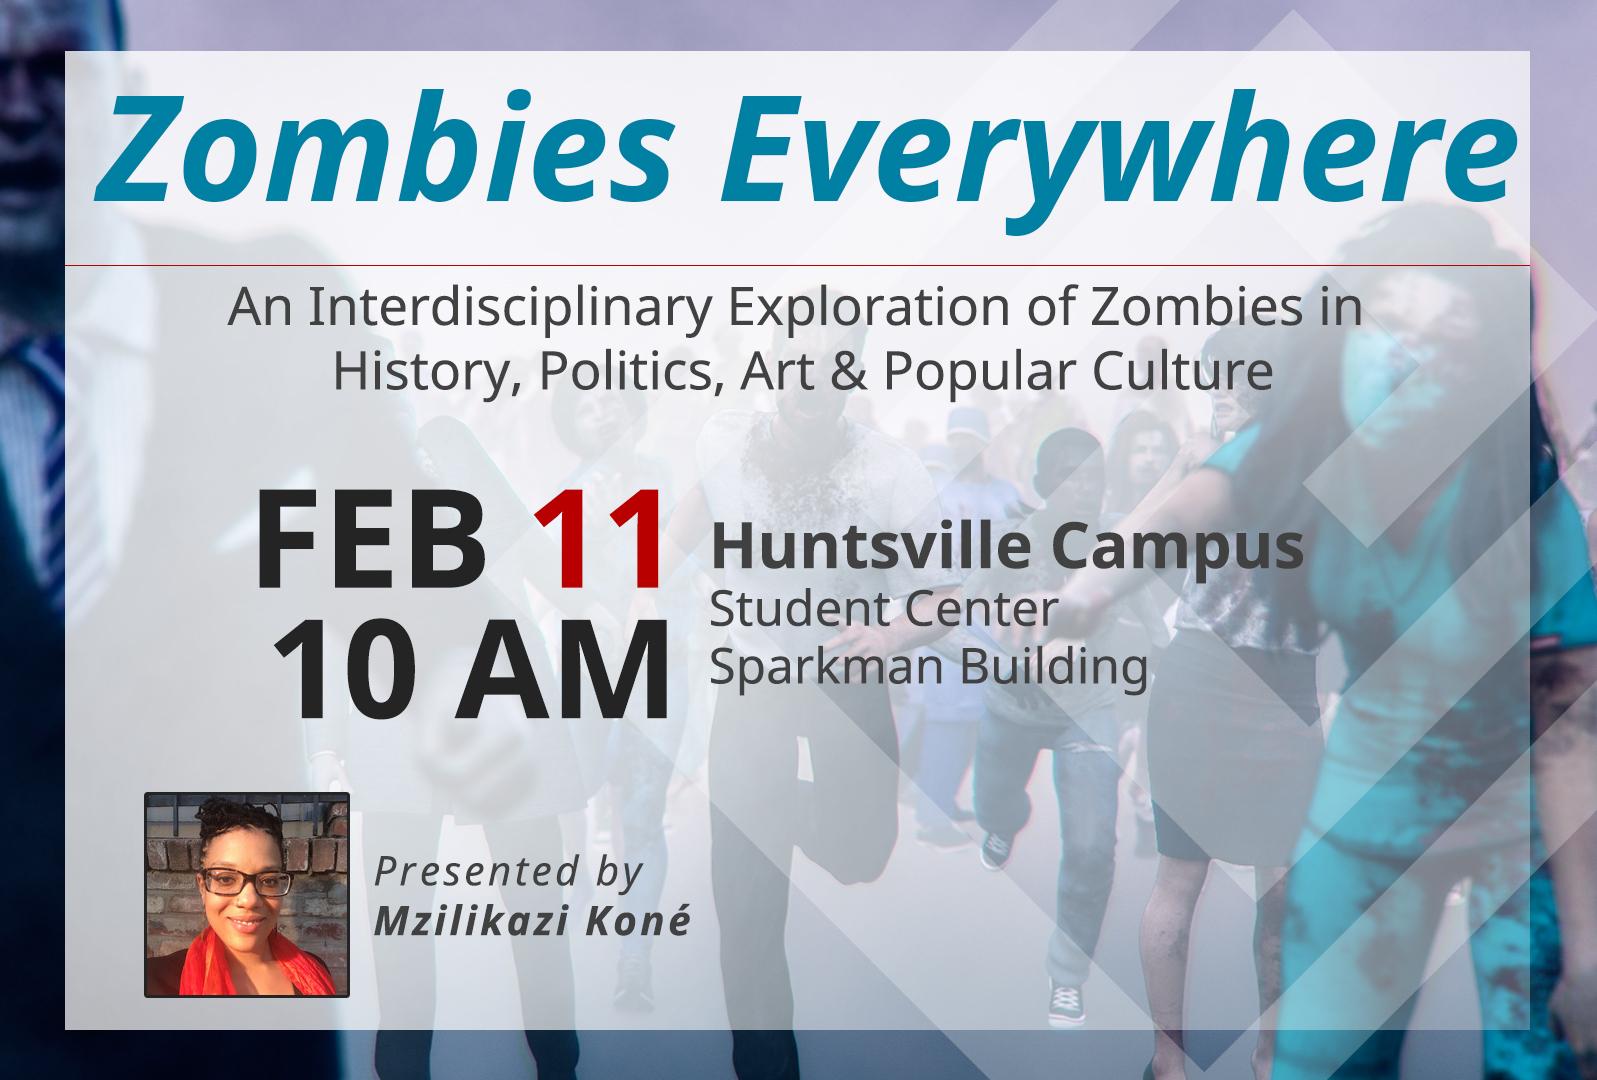 Zombies Everywhere - An Interdisciplinary Exploration of Zombies in History, Politics, Art & Popular Culture. Feb 11, 10AM. huntsville Campus, Student Center, Sparkman Building. Presented by Mzilikazi Kone